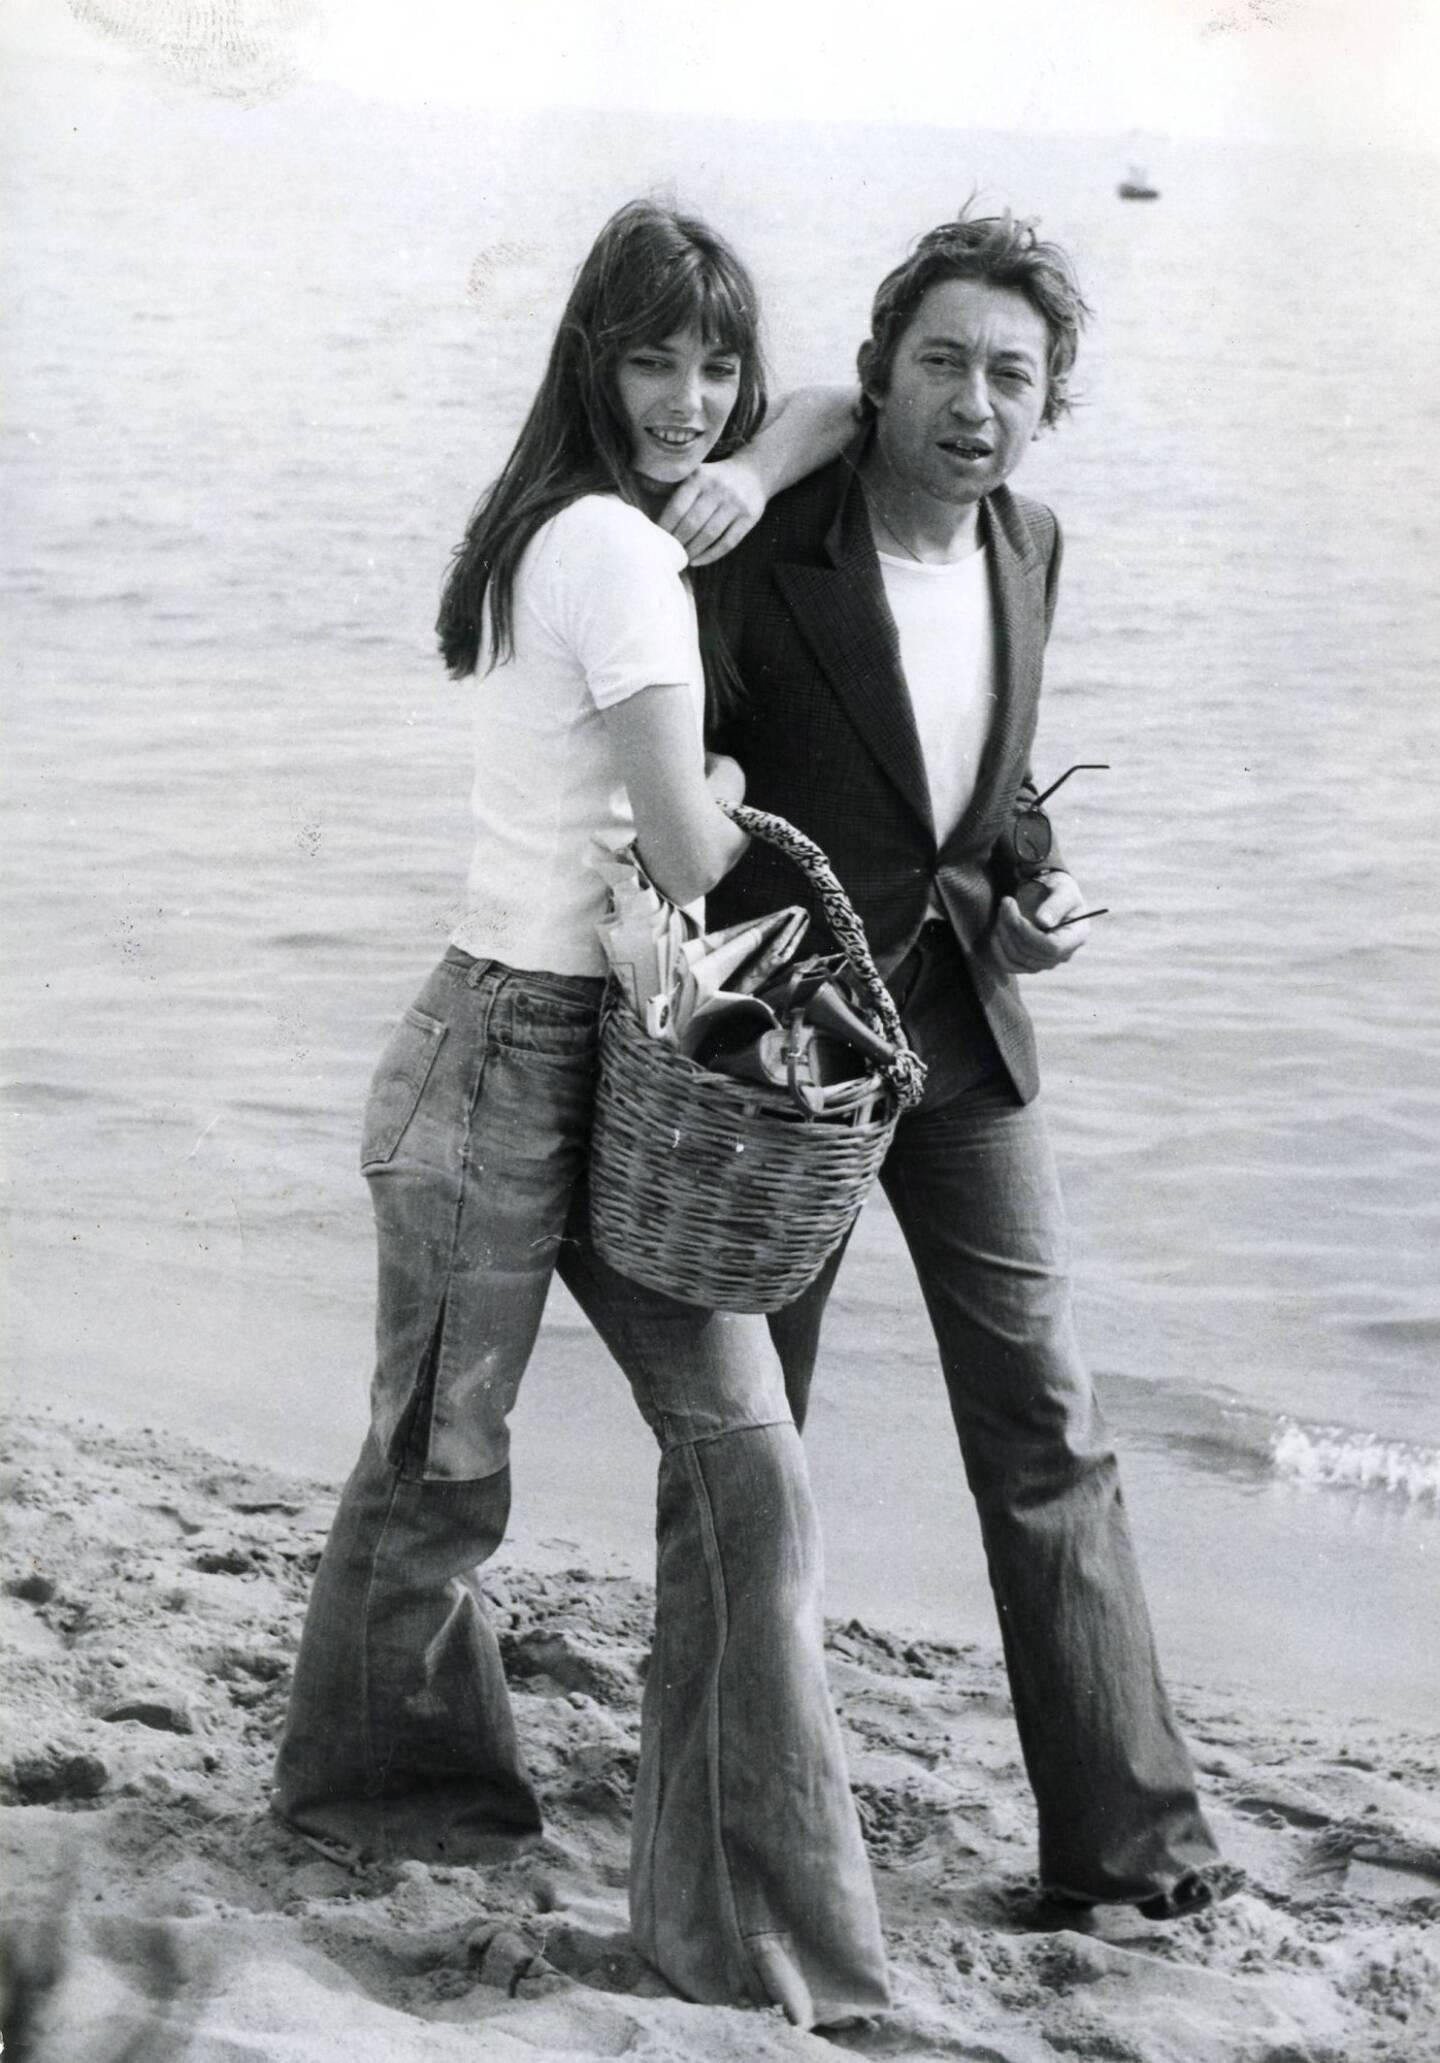 Jane Birkin et Serge Gainsbourg à Cannes, en mai 1974.